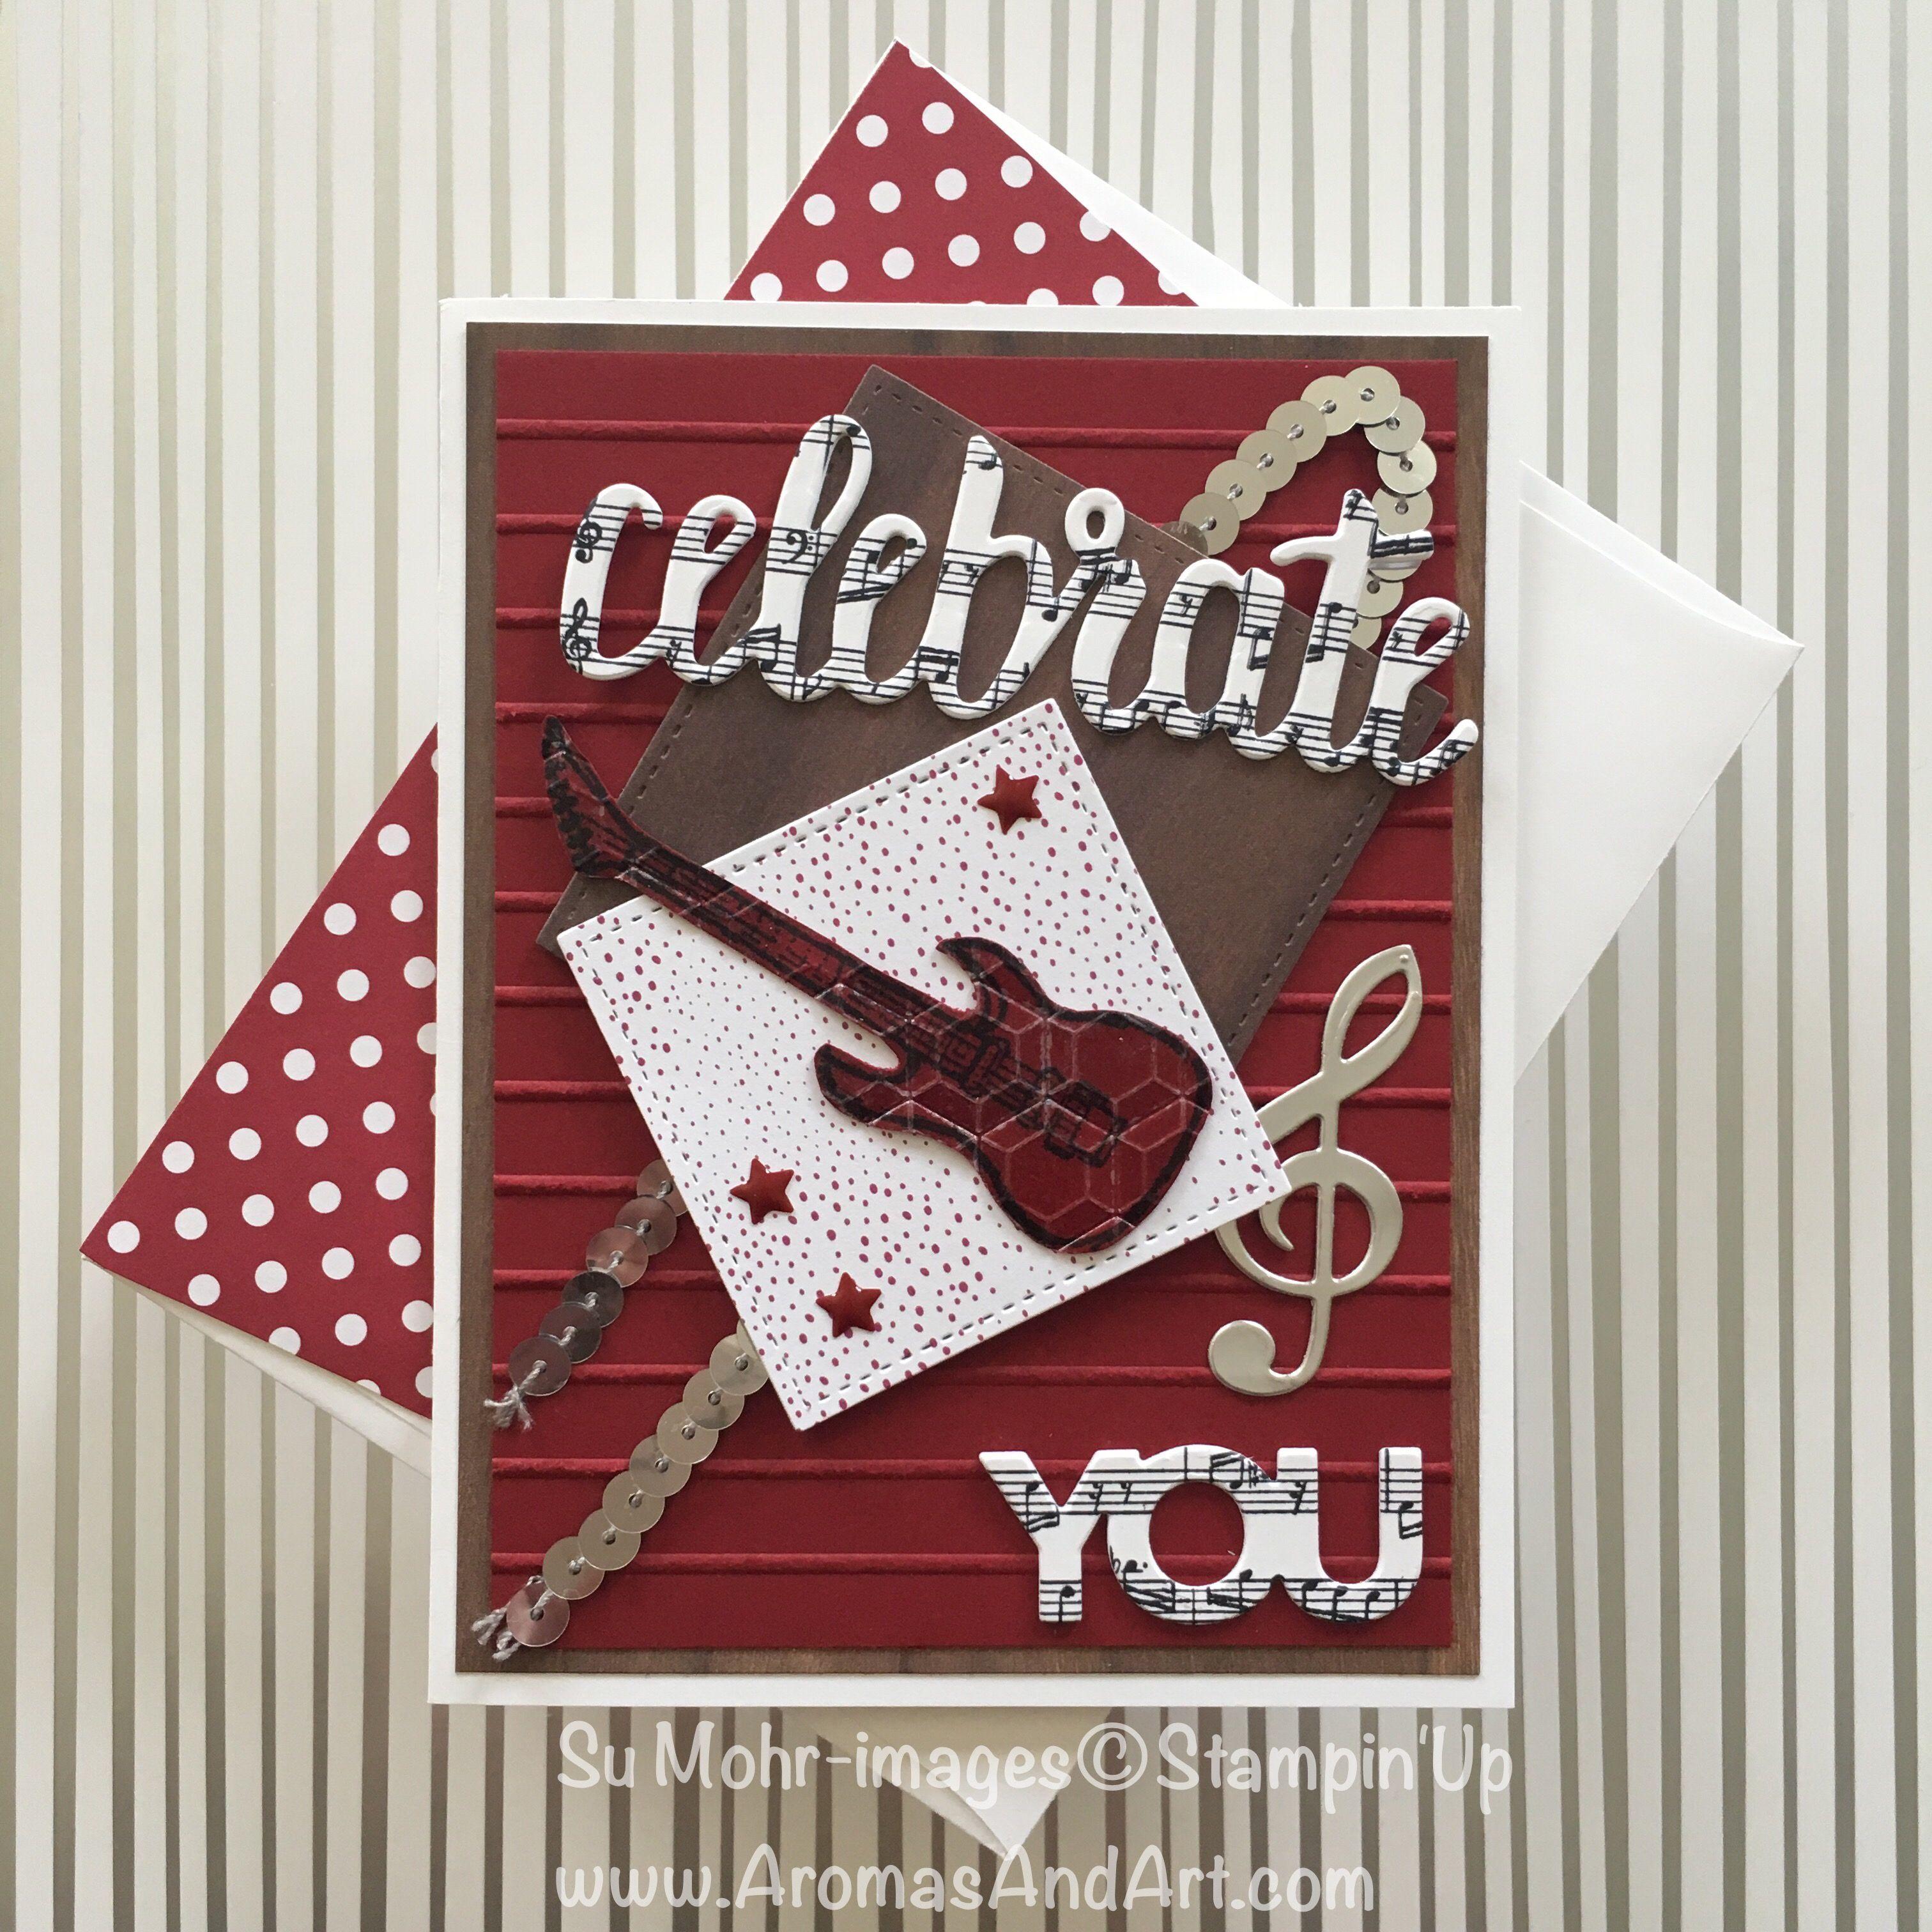 Sumohr Bass Guitar Birthday Card Collage Art Musical Birthday Cards Stampin Up Birthday Cards Birthday Cards